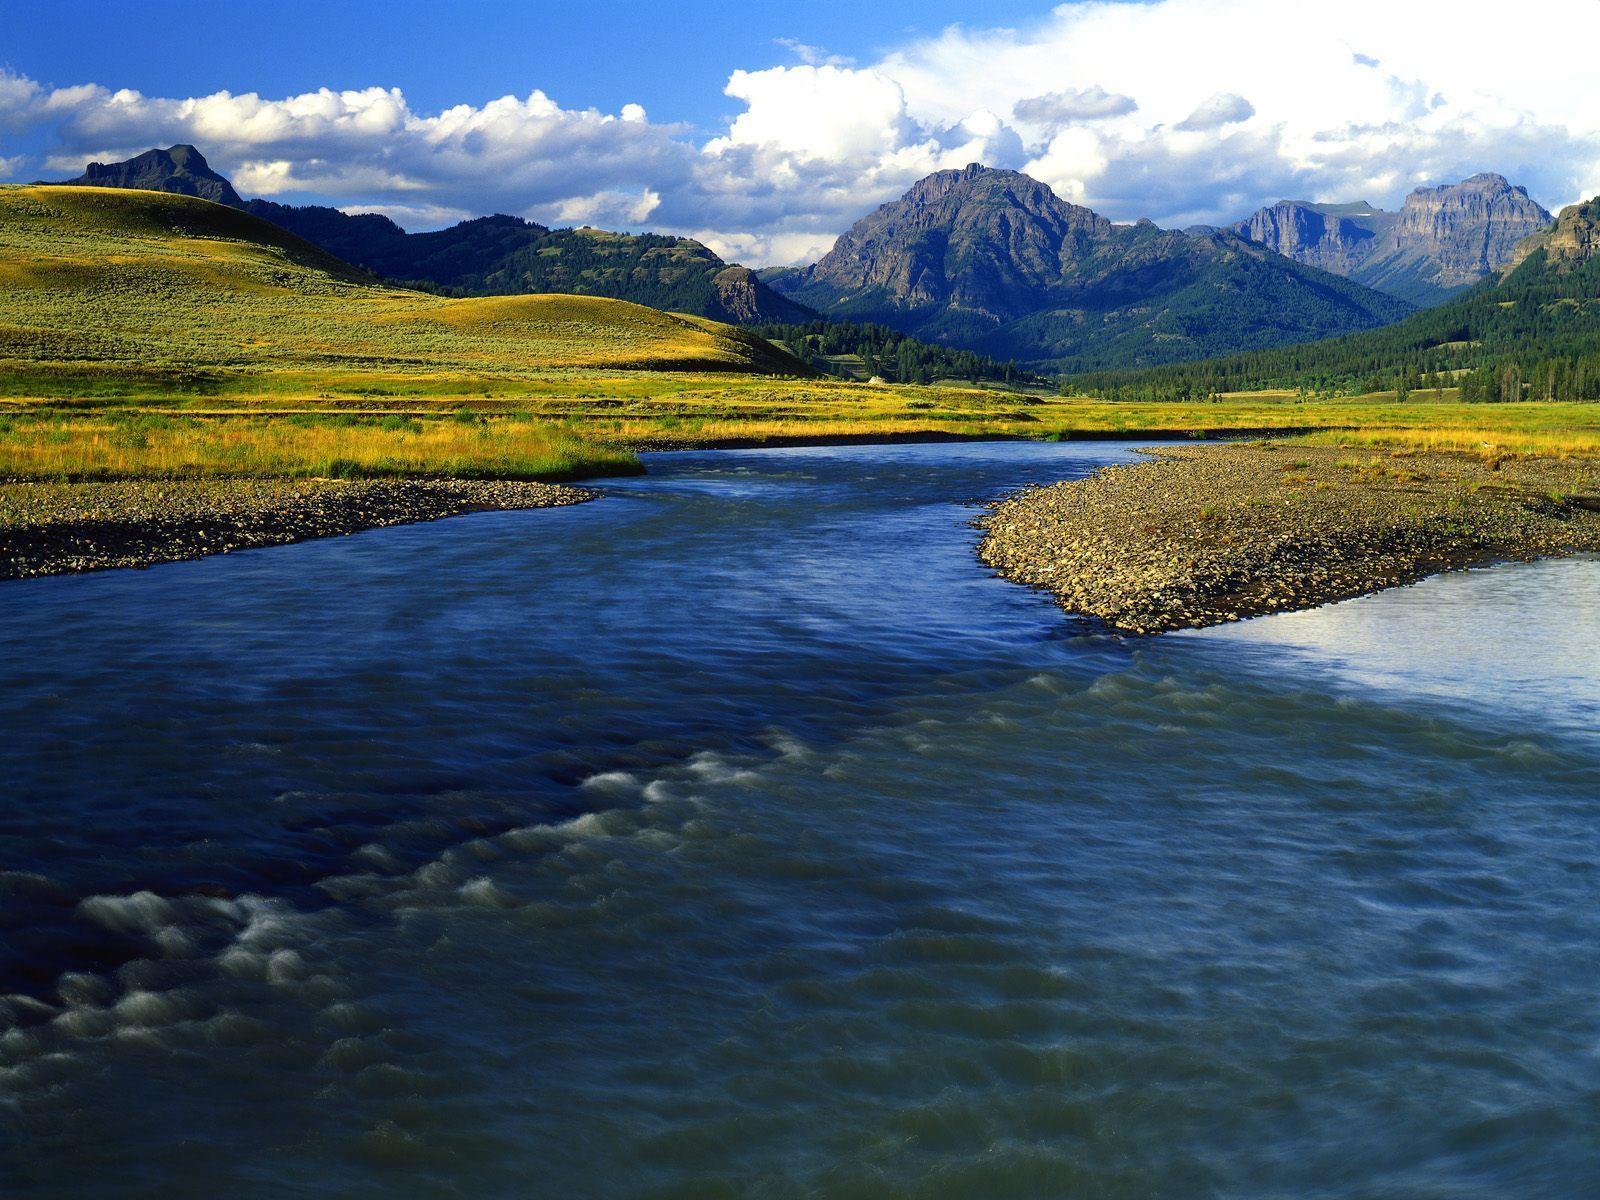 Lamar Valley Yellowstone National Park If Im Not Going To - Us national parks yellowstone